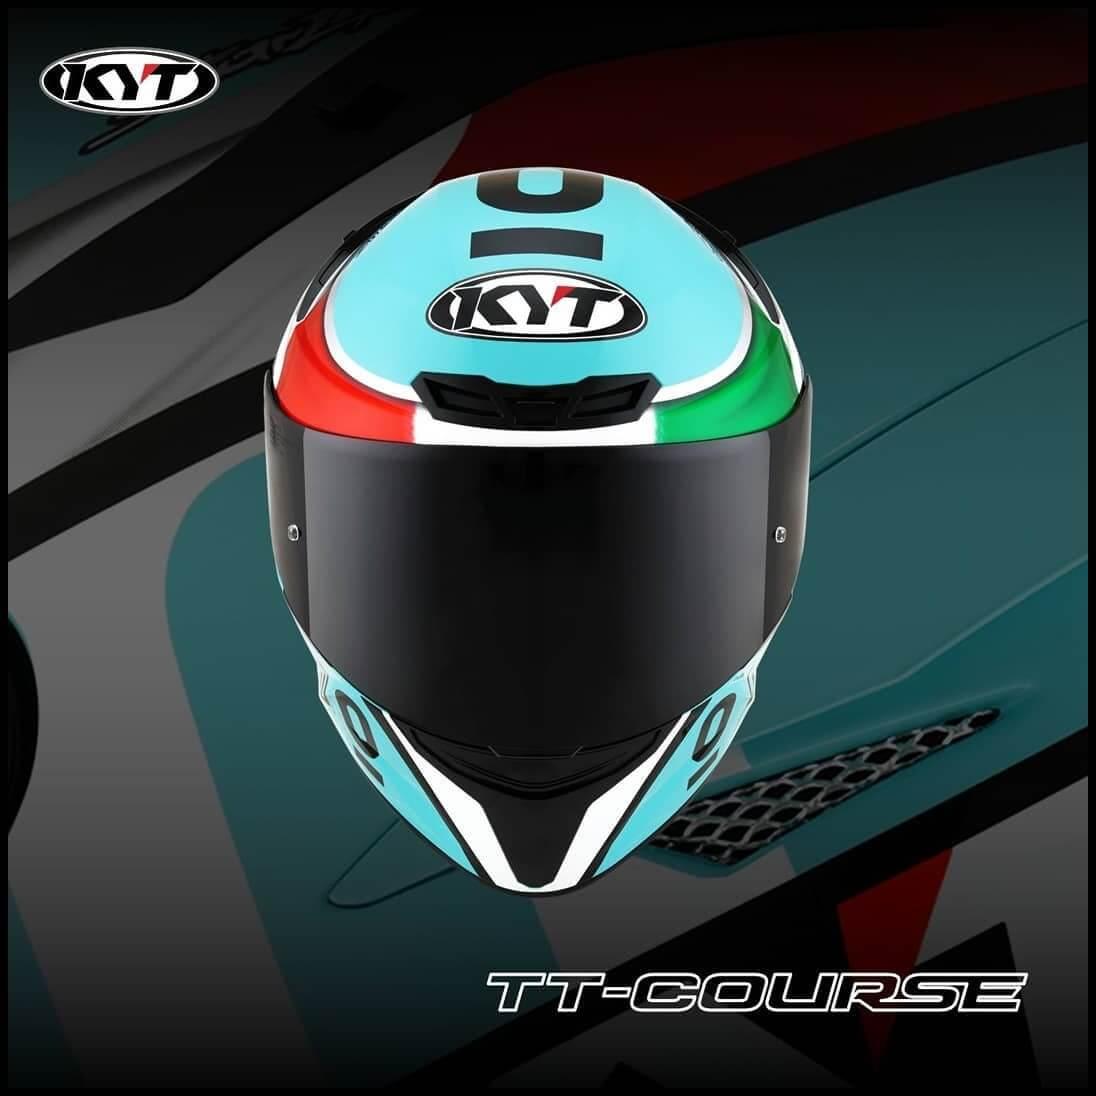 KYT TT Course Tampak Depan